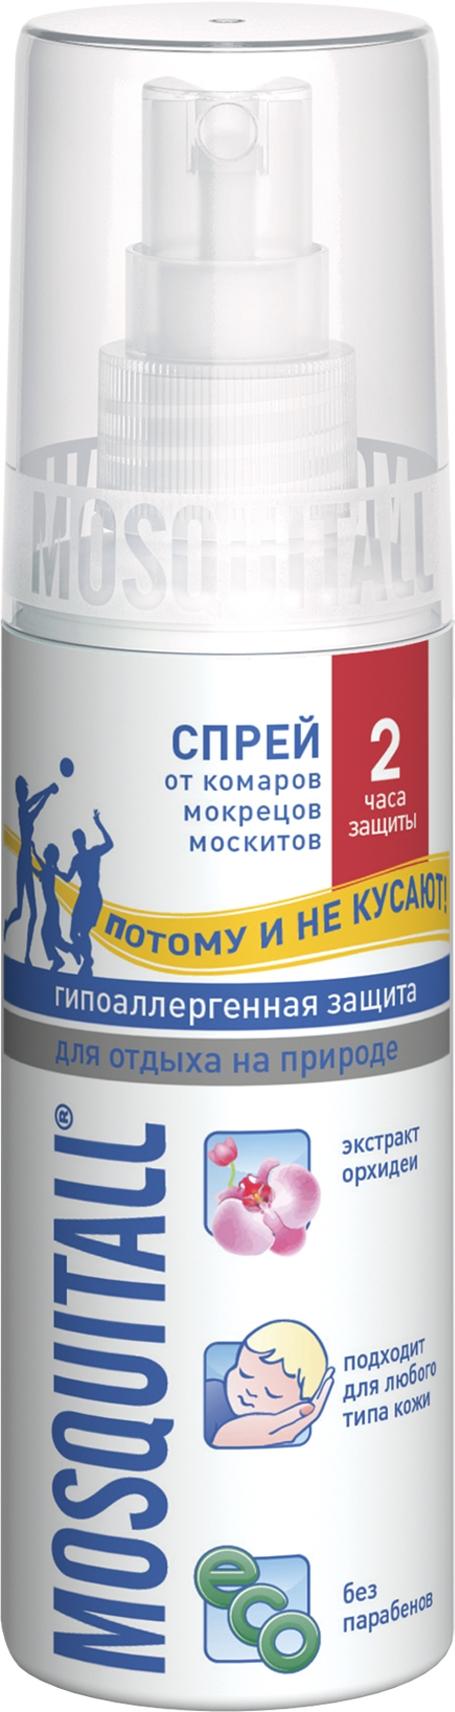 Спрей Mosquitall Гипоаллергенная защита от комаров 100 мл от комаров защита